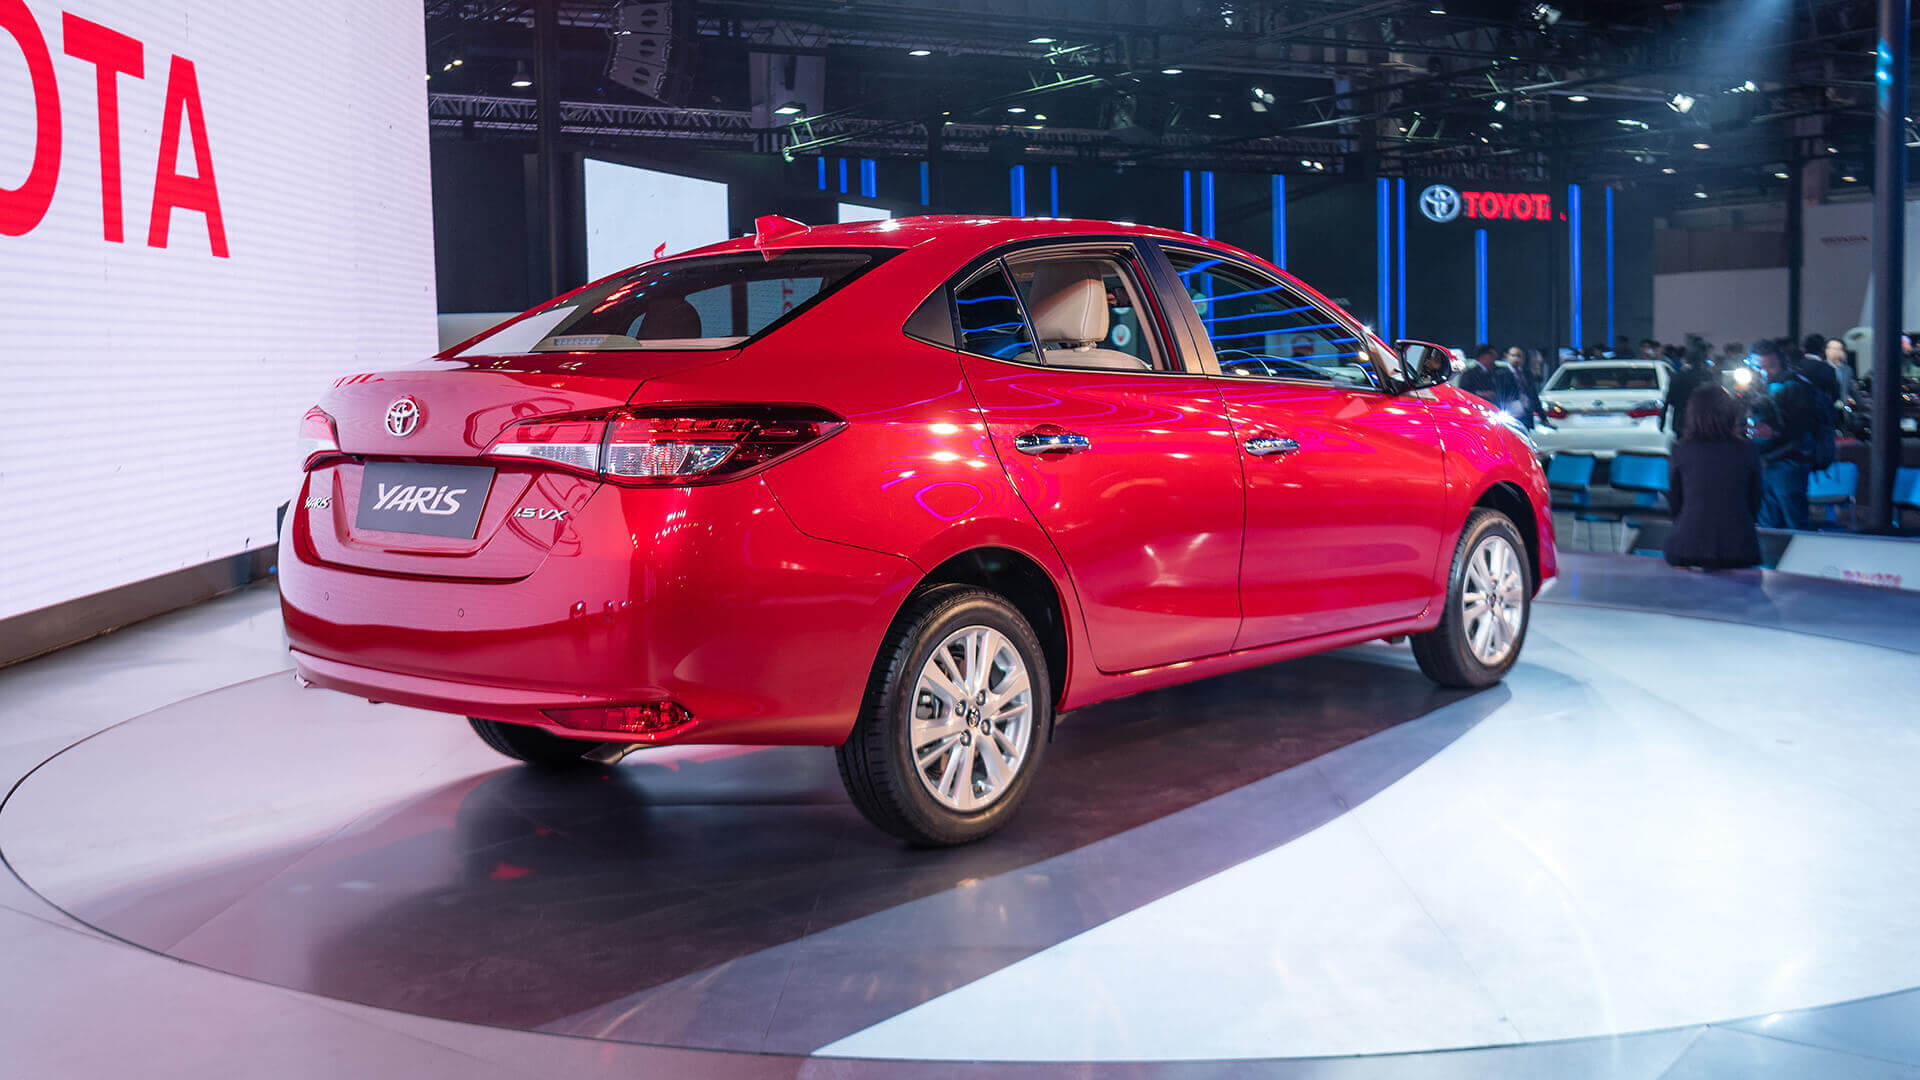 Toyota-Yaris-India-Auto-Expo-2018_5